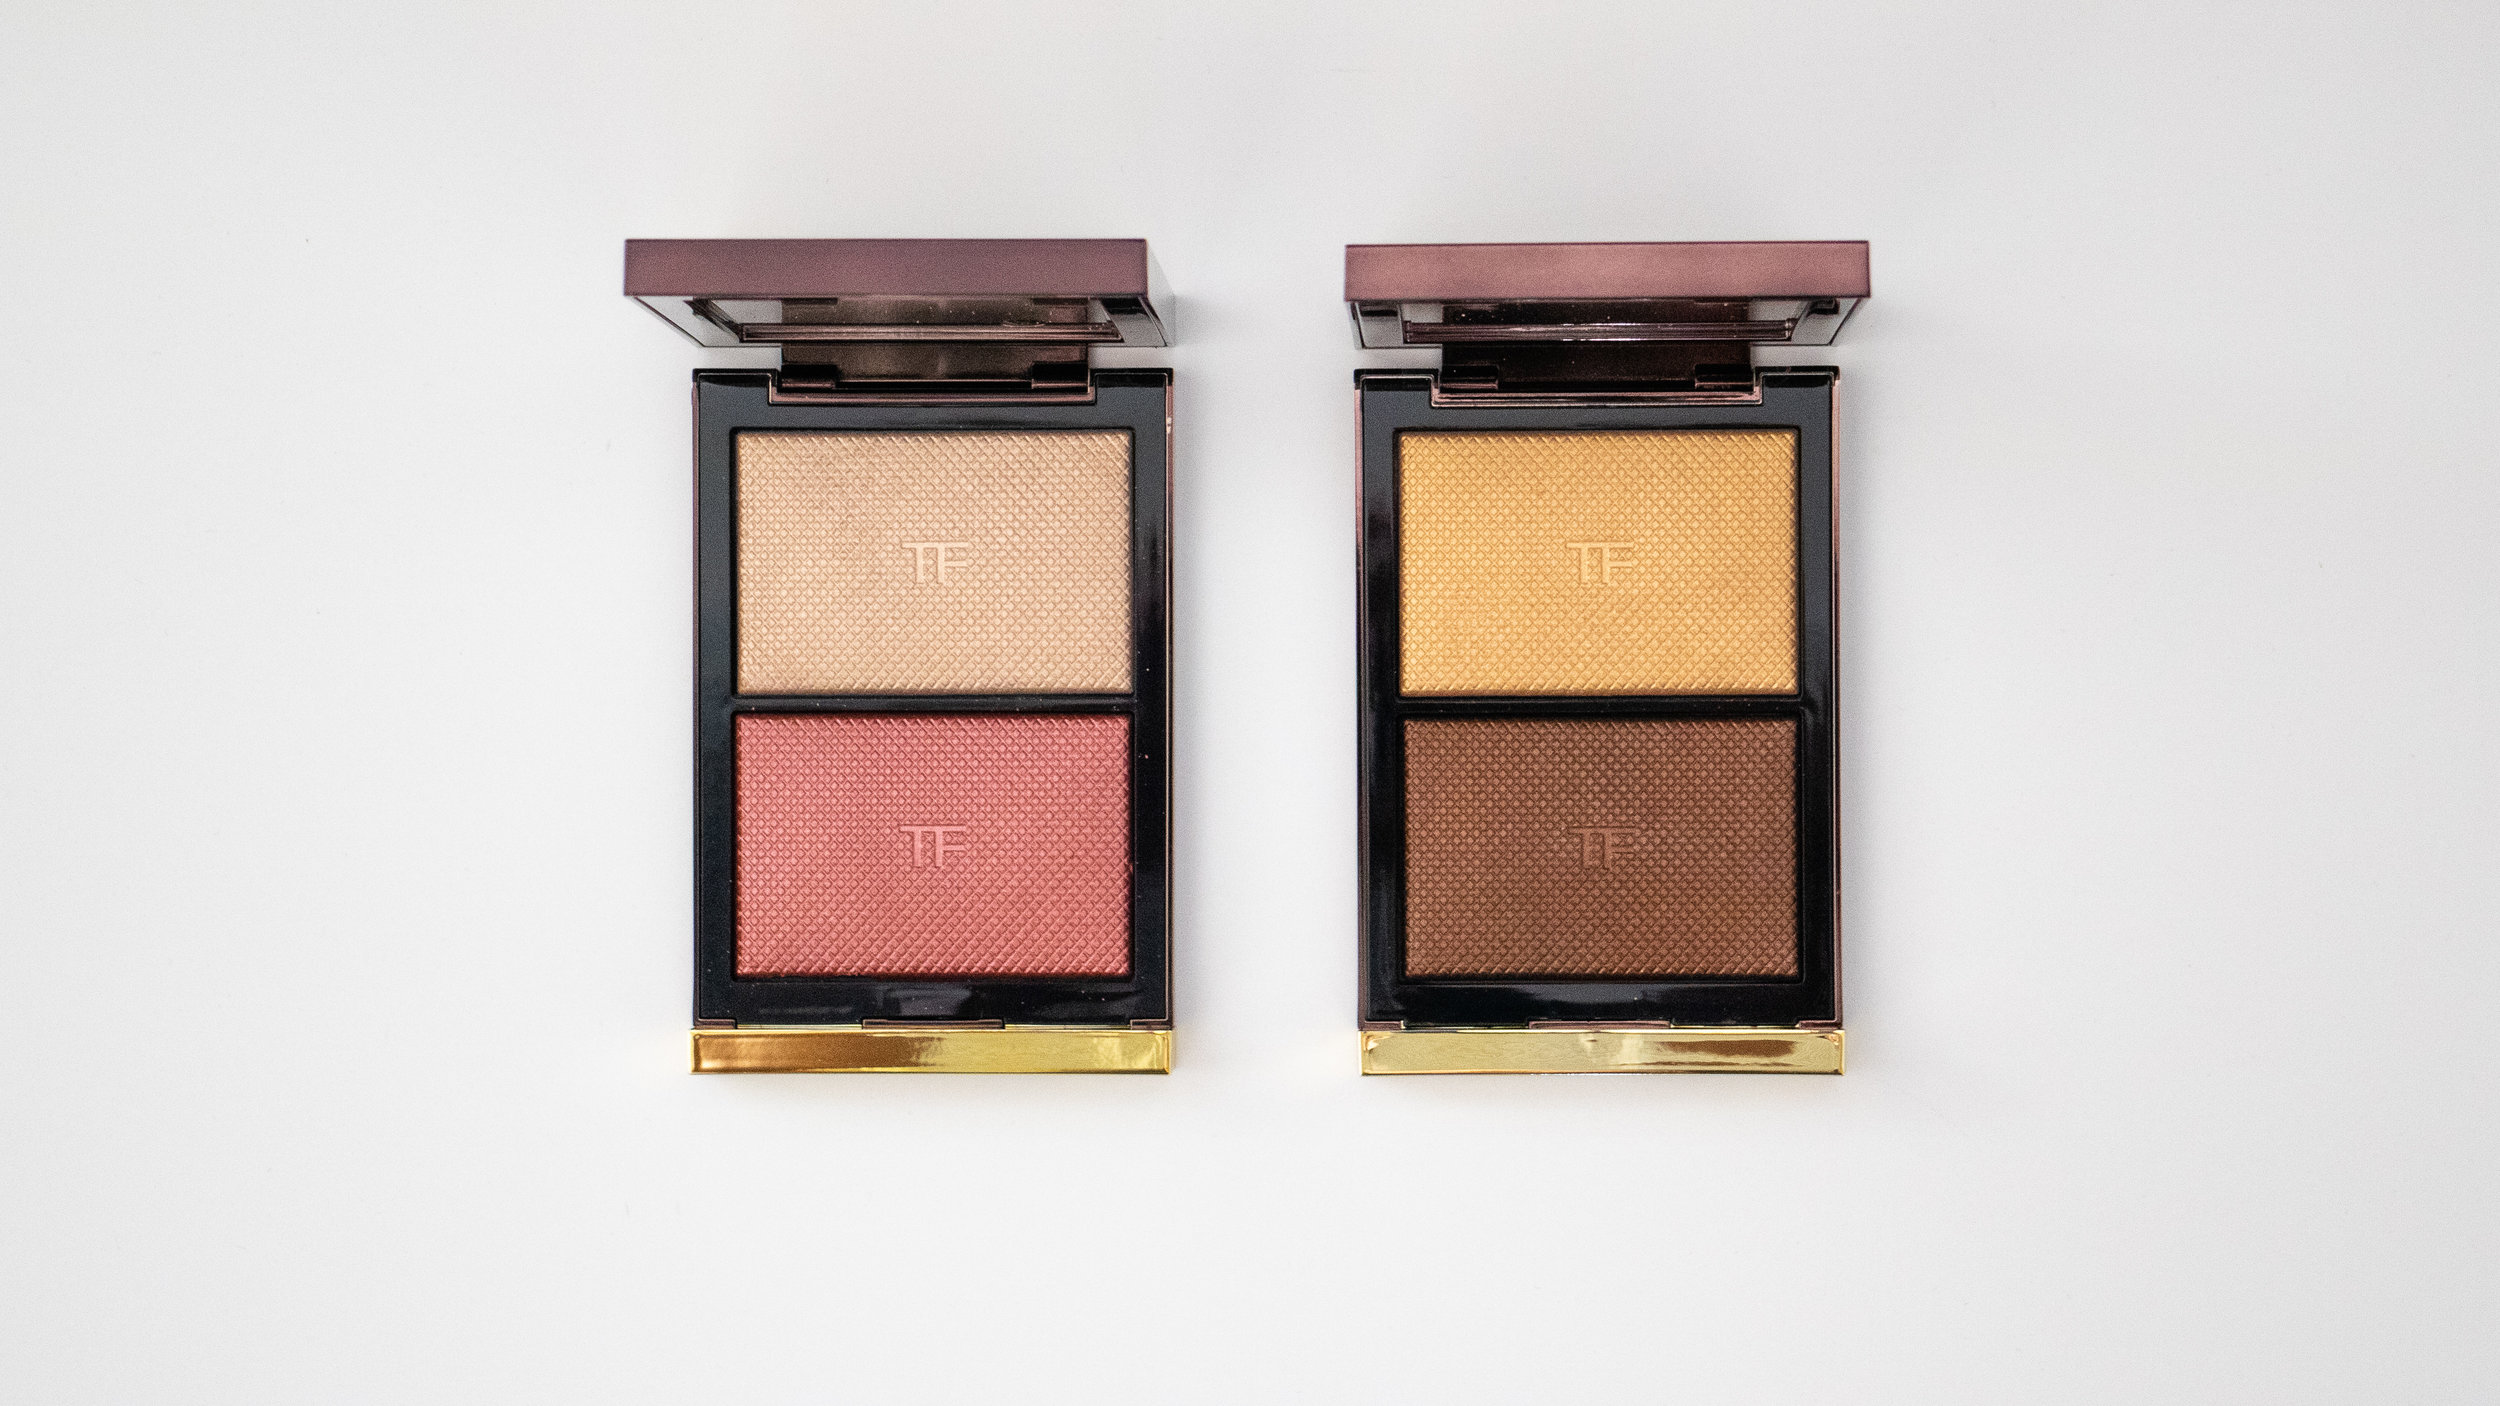 Tom Ford Skin Illuminating Powder Duos. Incandescent (L), Flicker (R).